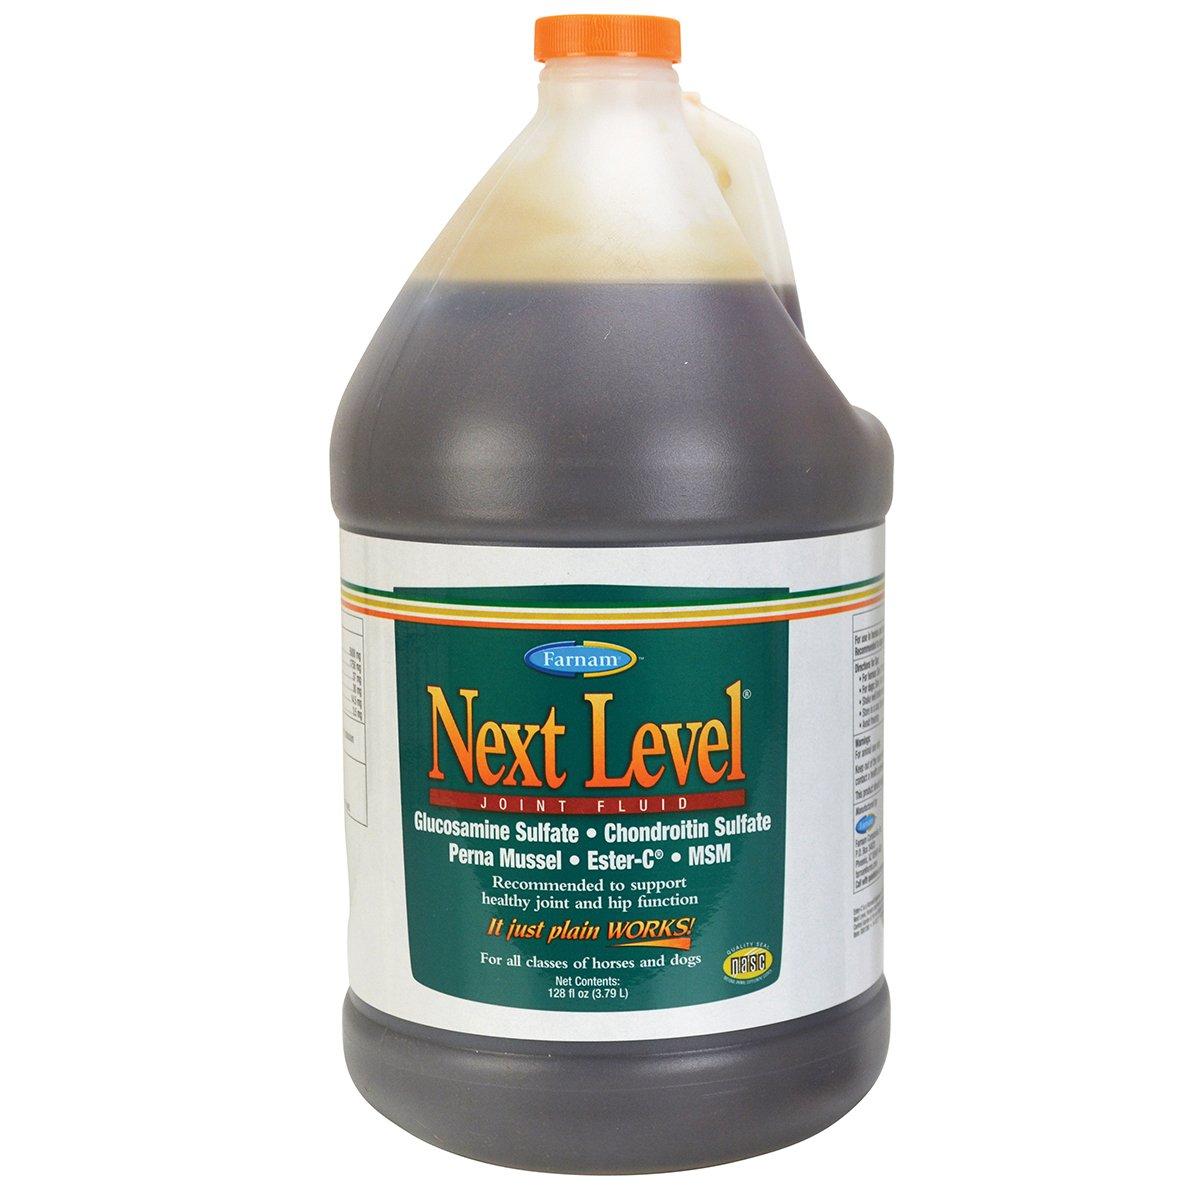 Farnam Next Level Joint Fluid, 1 Gallon